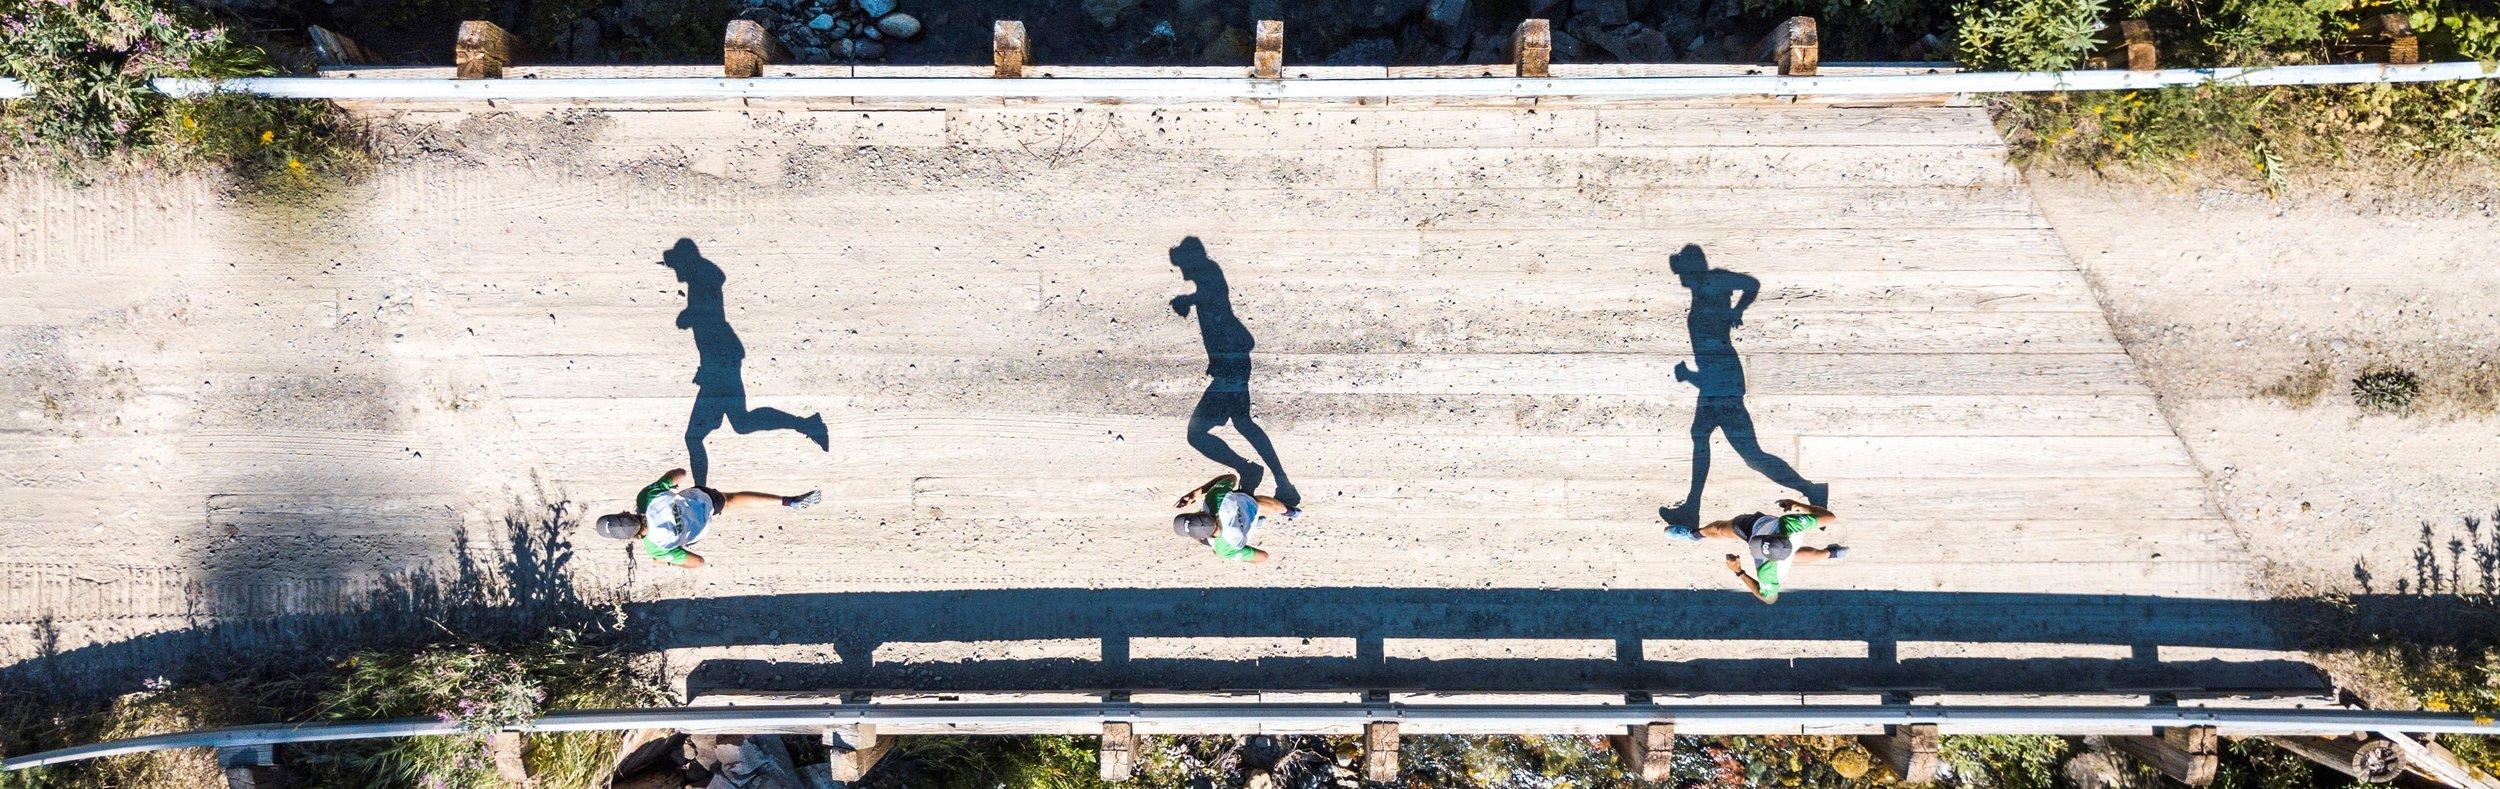 runners shadows crossing a bridge in Montana